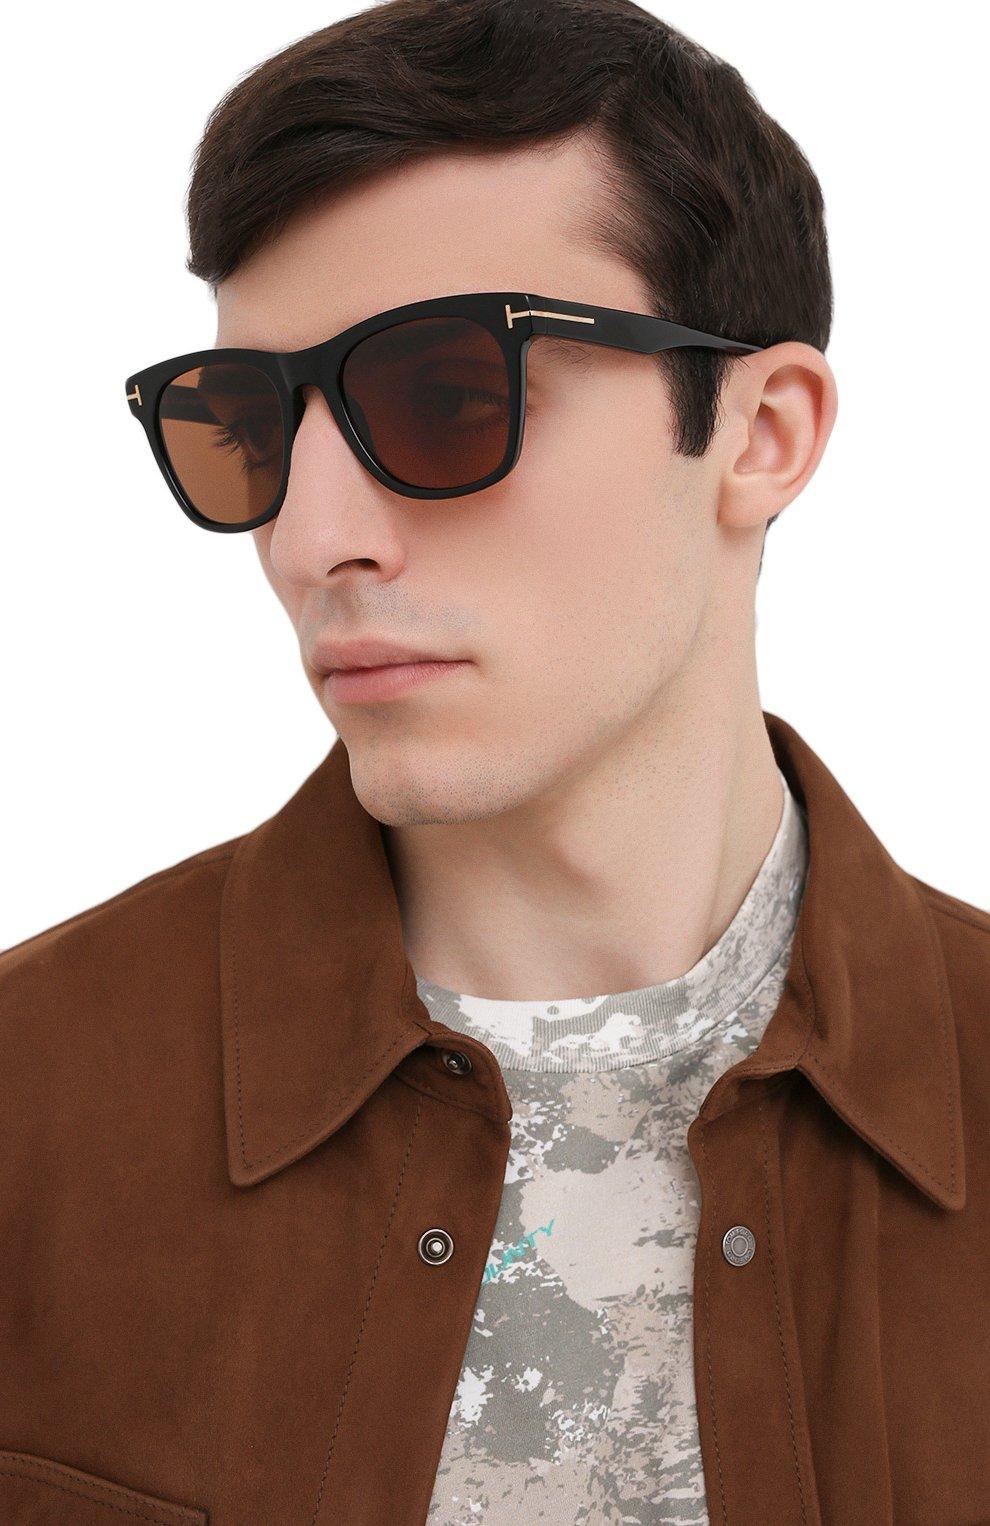 Мужские солнцезащитные очки TOM FORD коричневого цвета, арт. TF833 01E   Фото 2